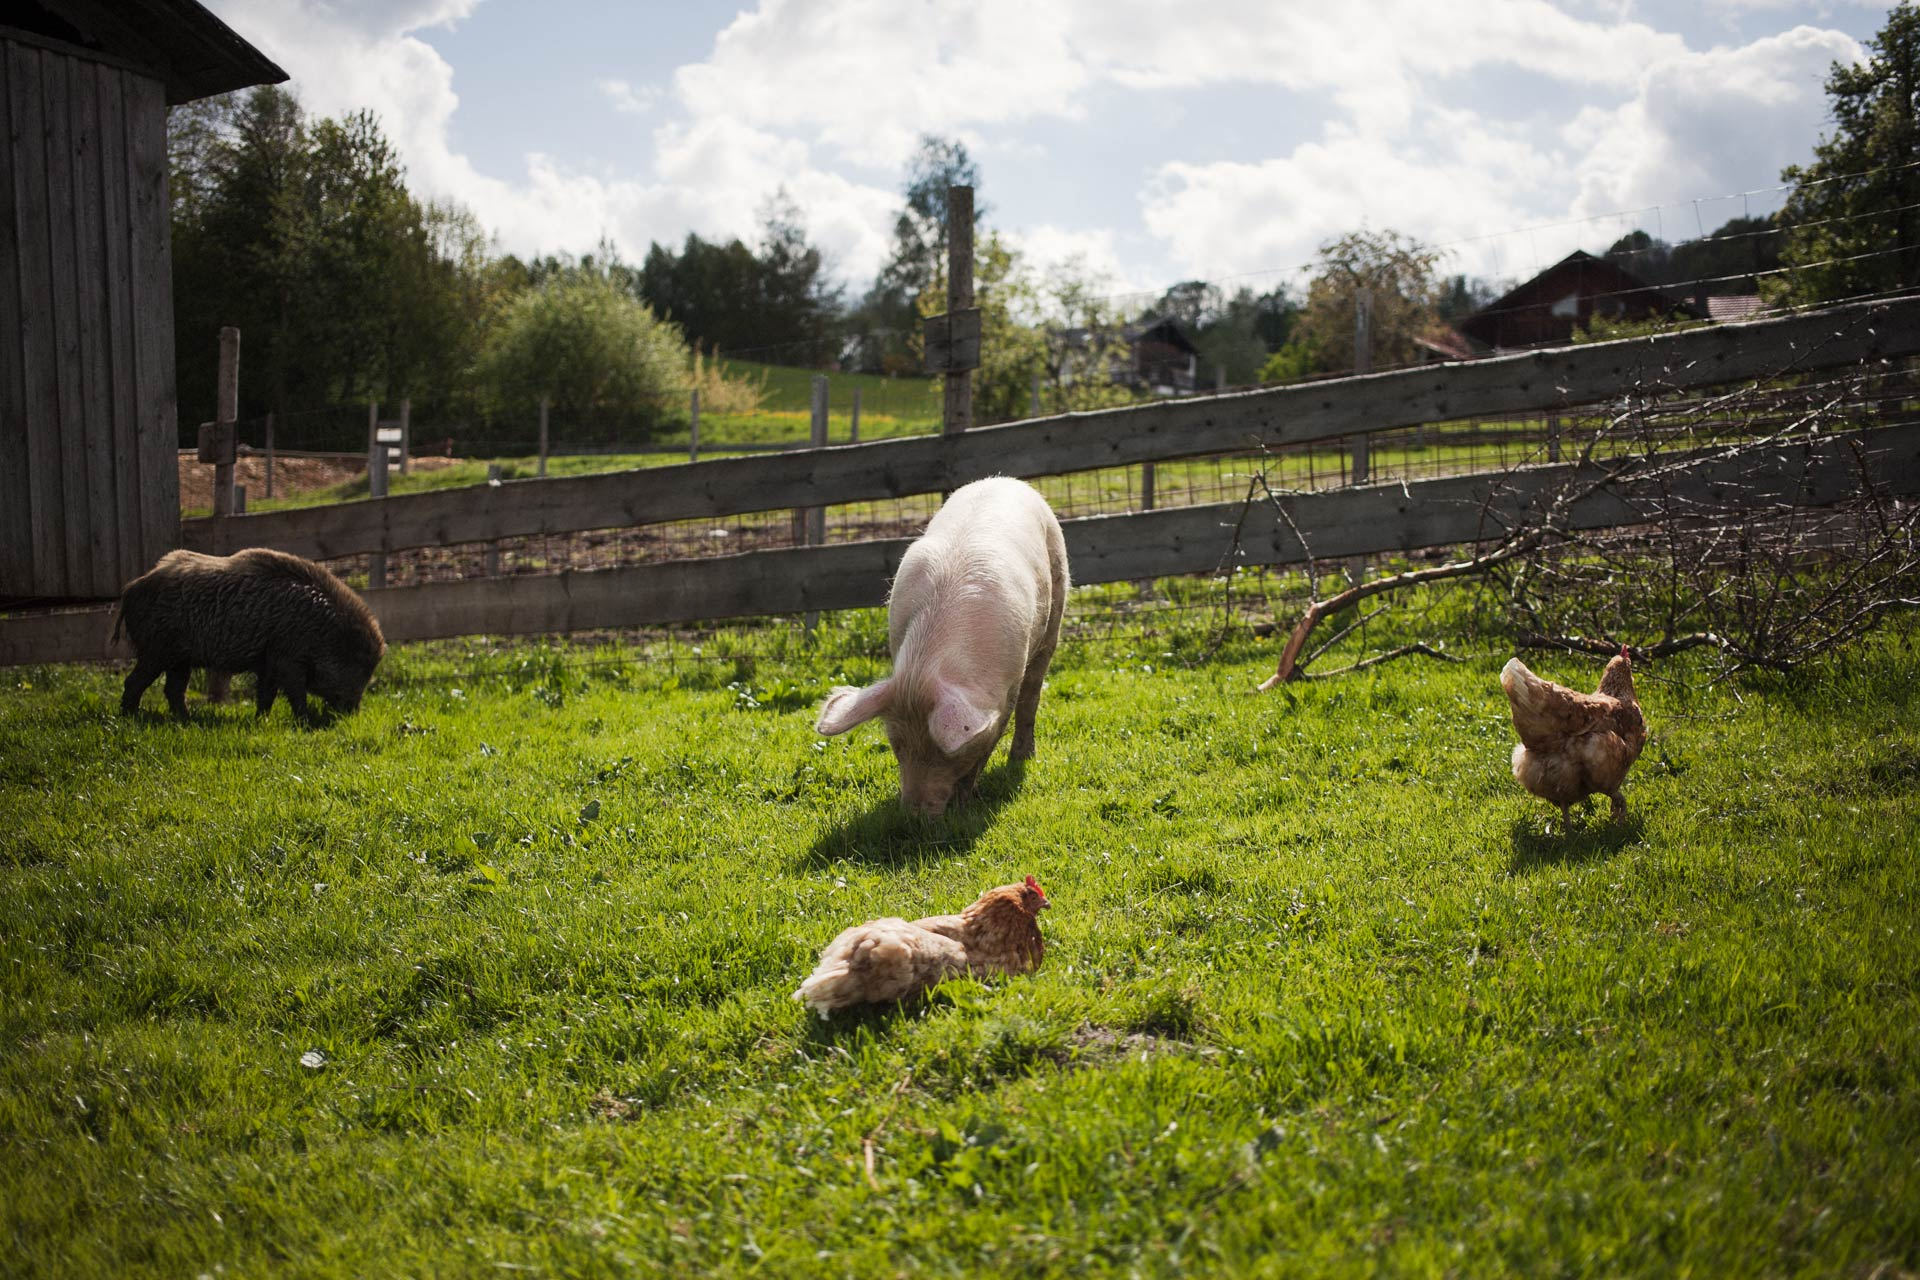 timo-stammberger-photography-animal-sanctuary-tiere-animals-pig-chicken-boar-erdlingshof-mitgefuehl-vegan-world-compassion